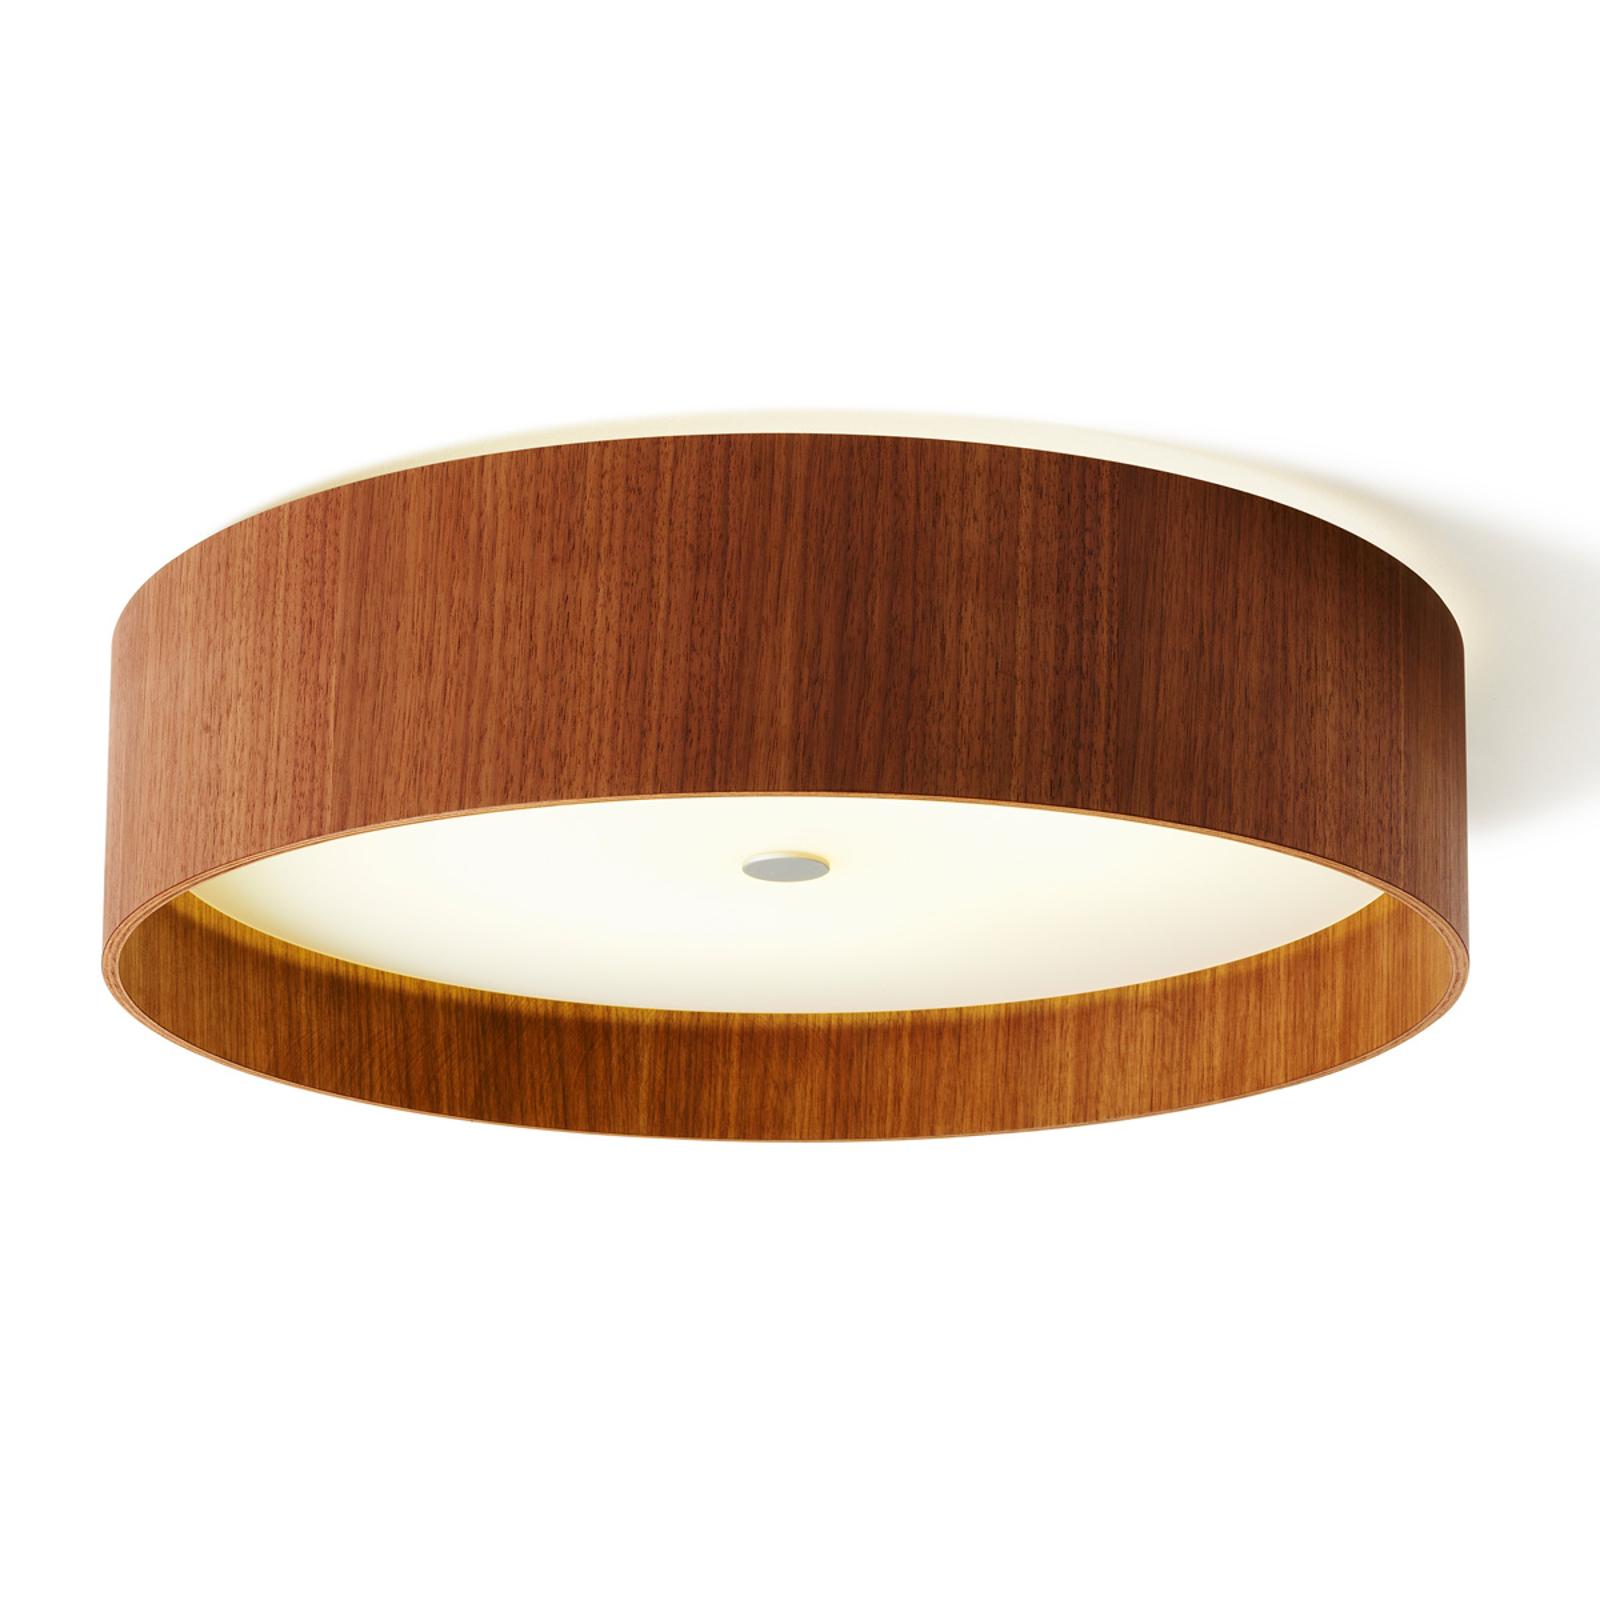 Lara wood – stropné LED svietidlo orech 55cm_2600505_1